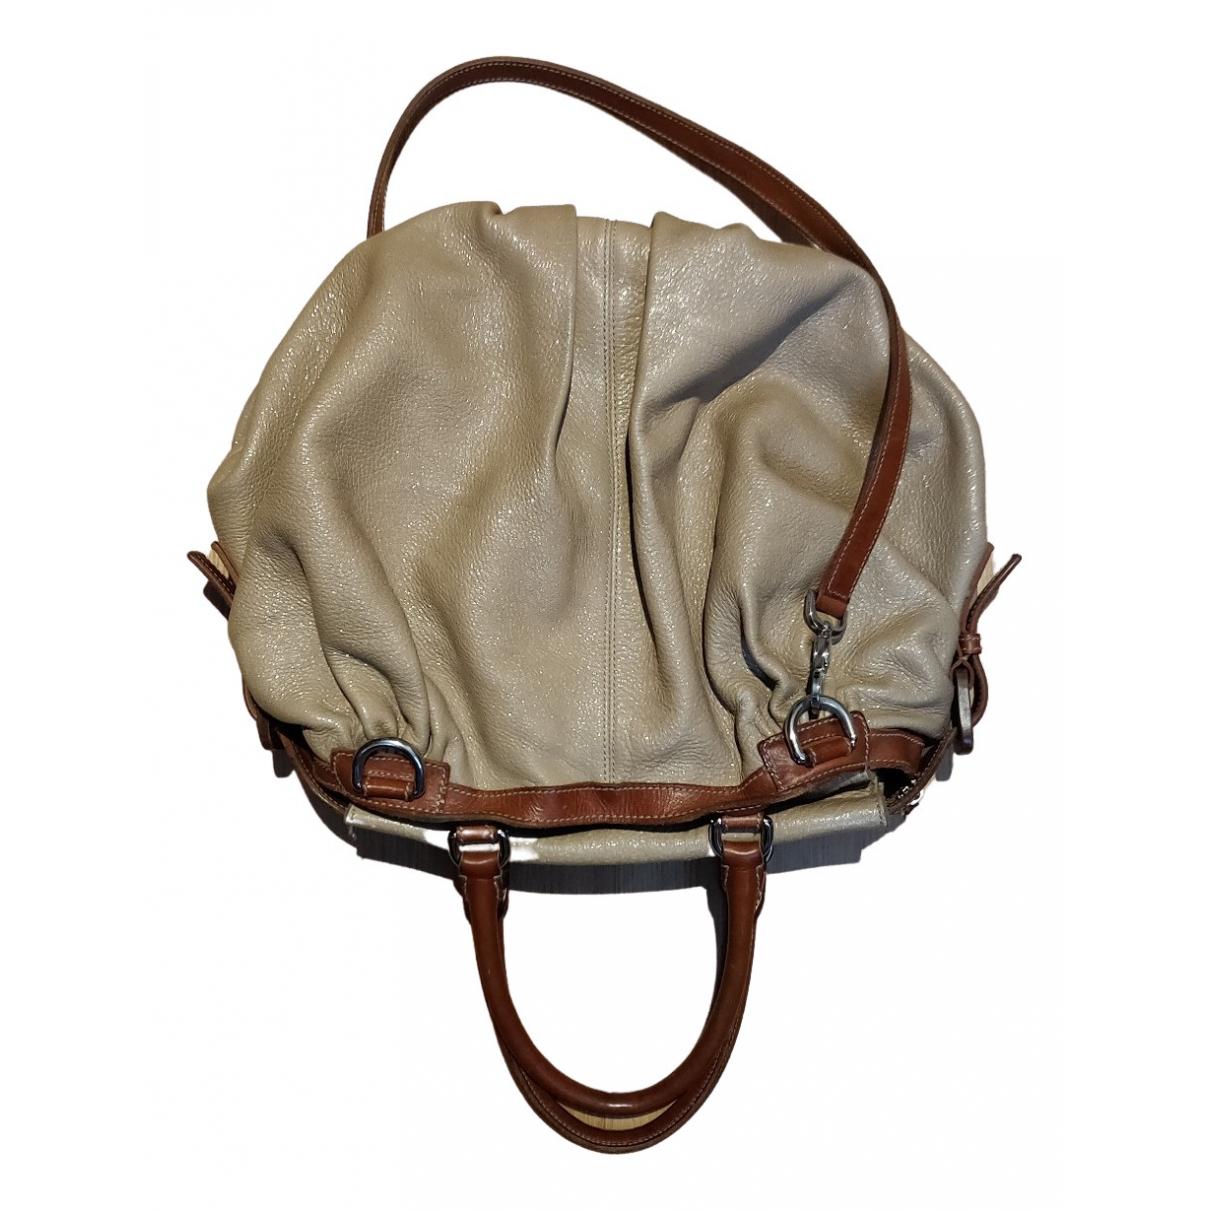 Dolce & Gabbana \N Beige Leather handbag for Women \N